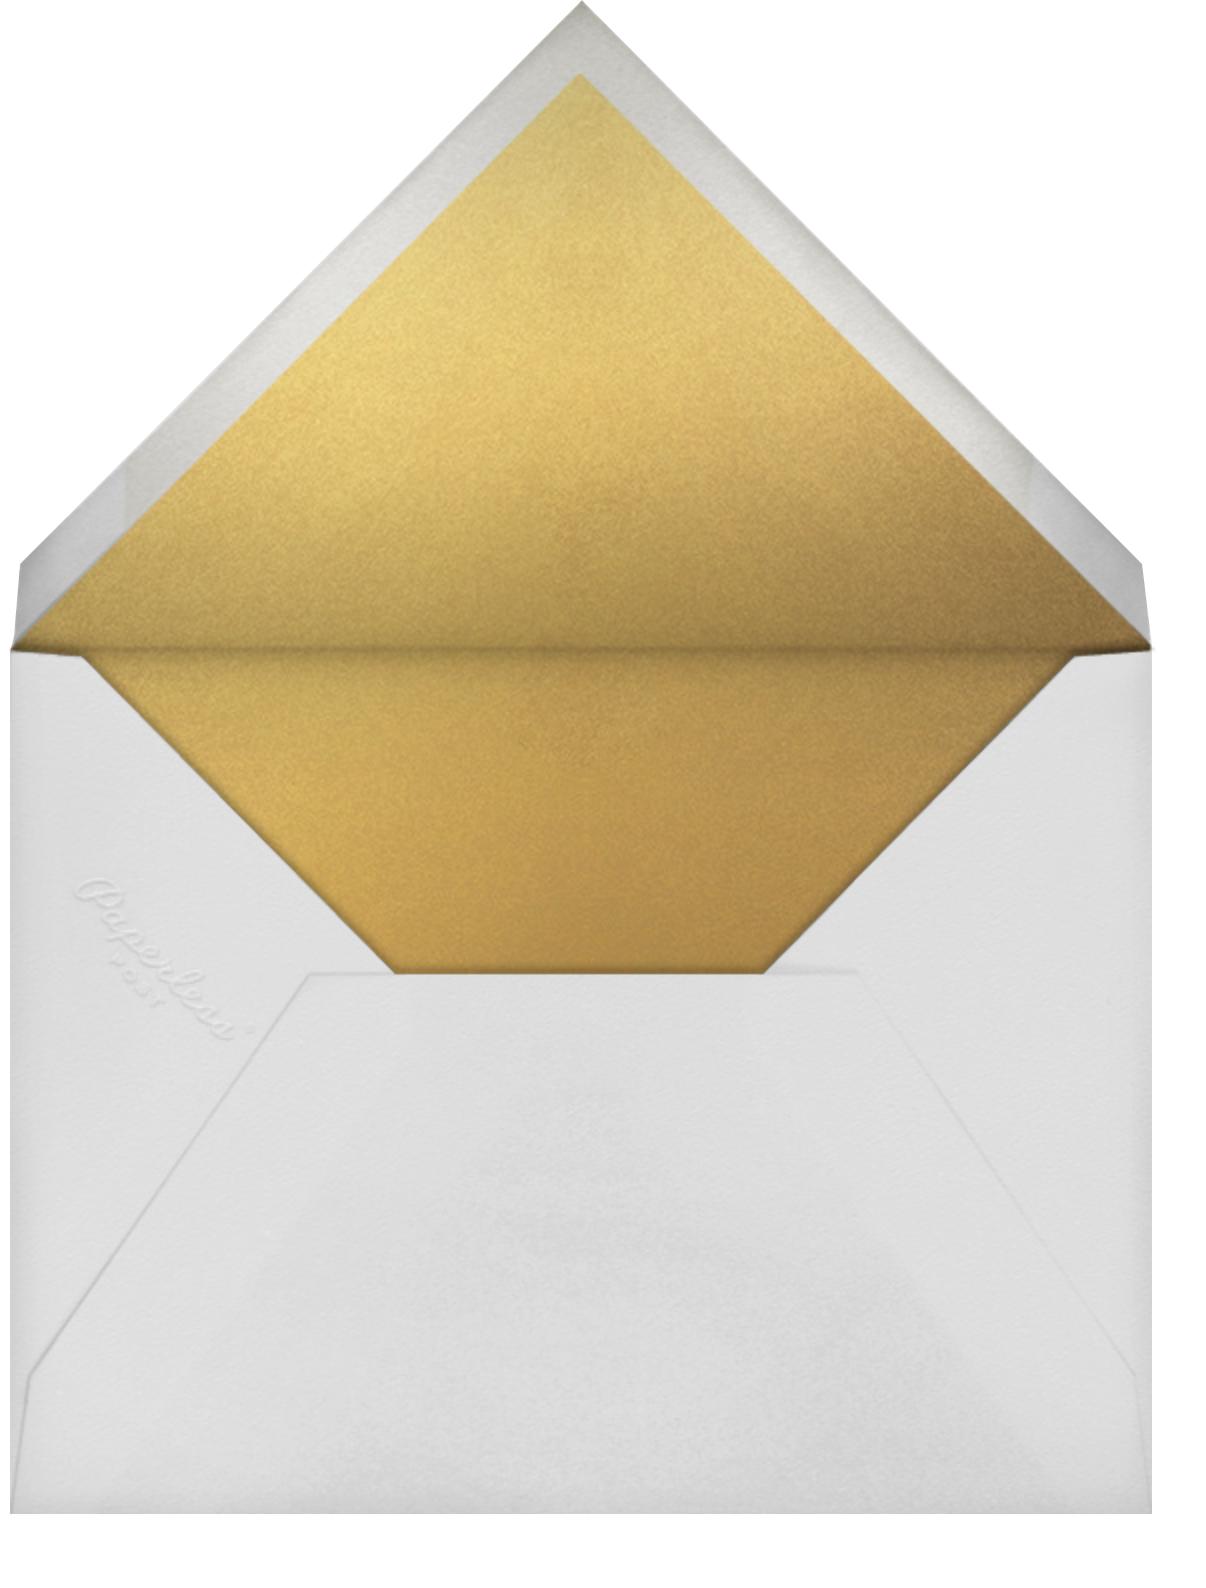 Polka Dot - Medium Gold - Oscar de la Renta - Envelope